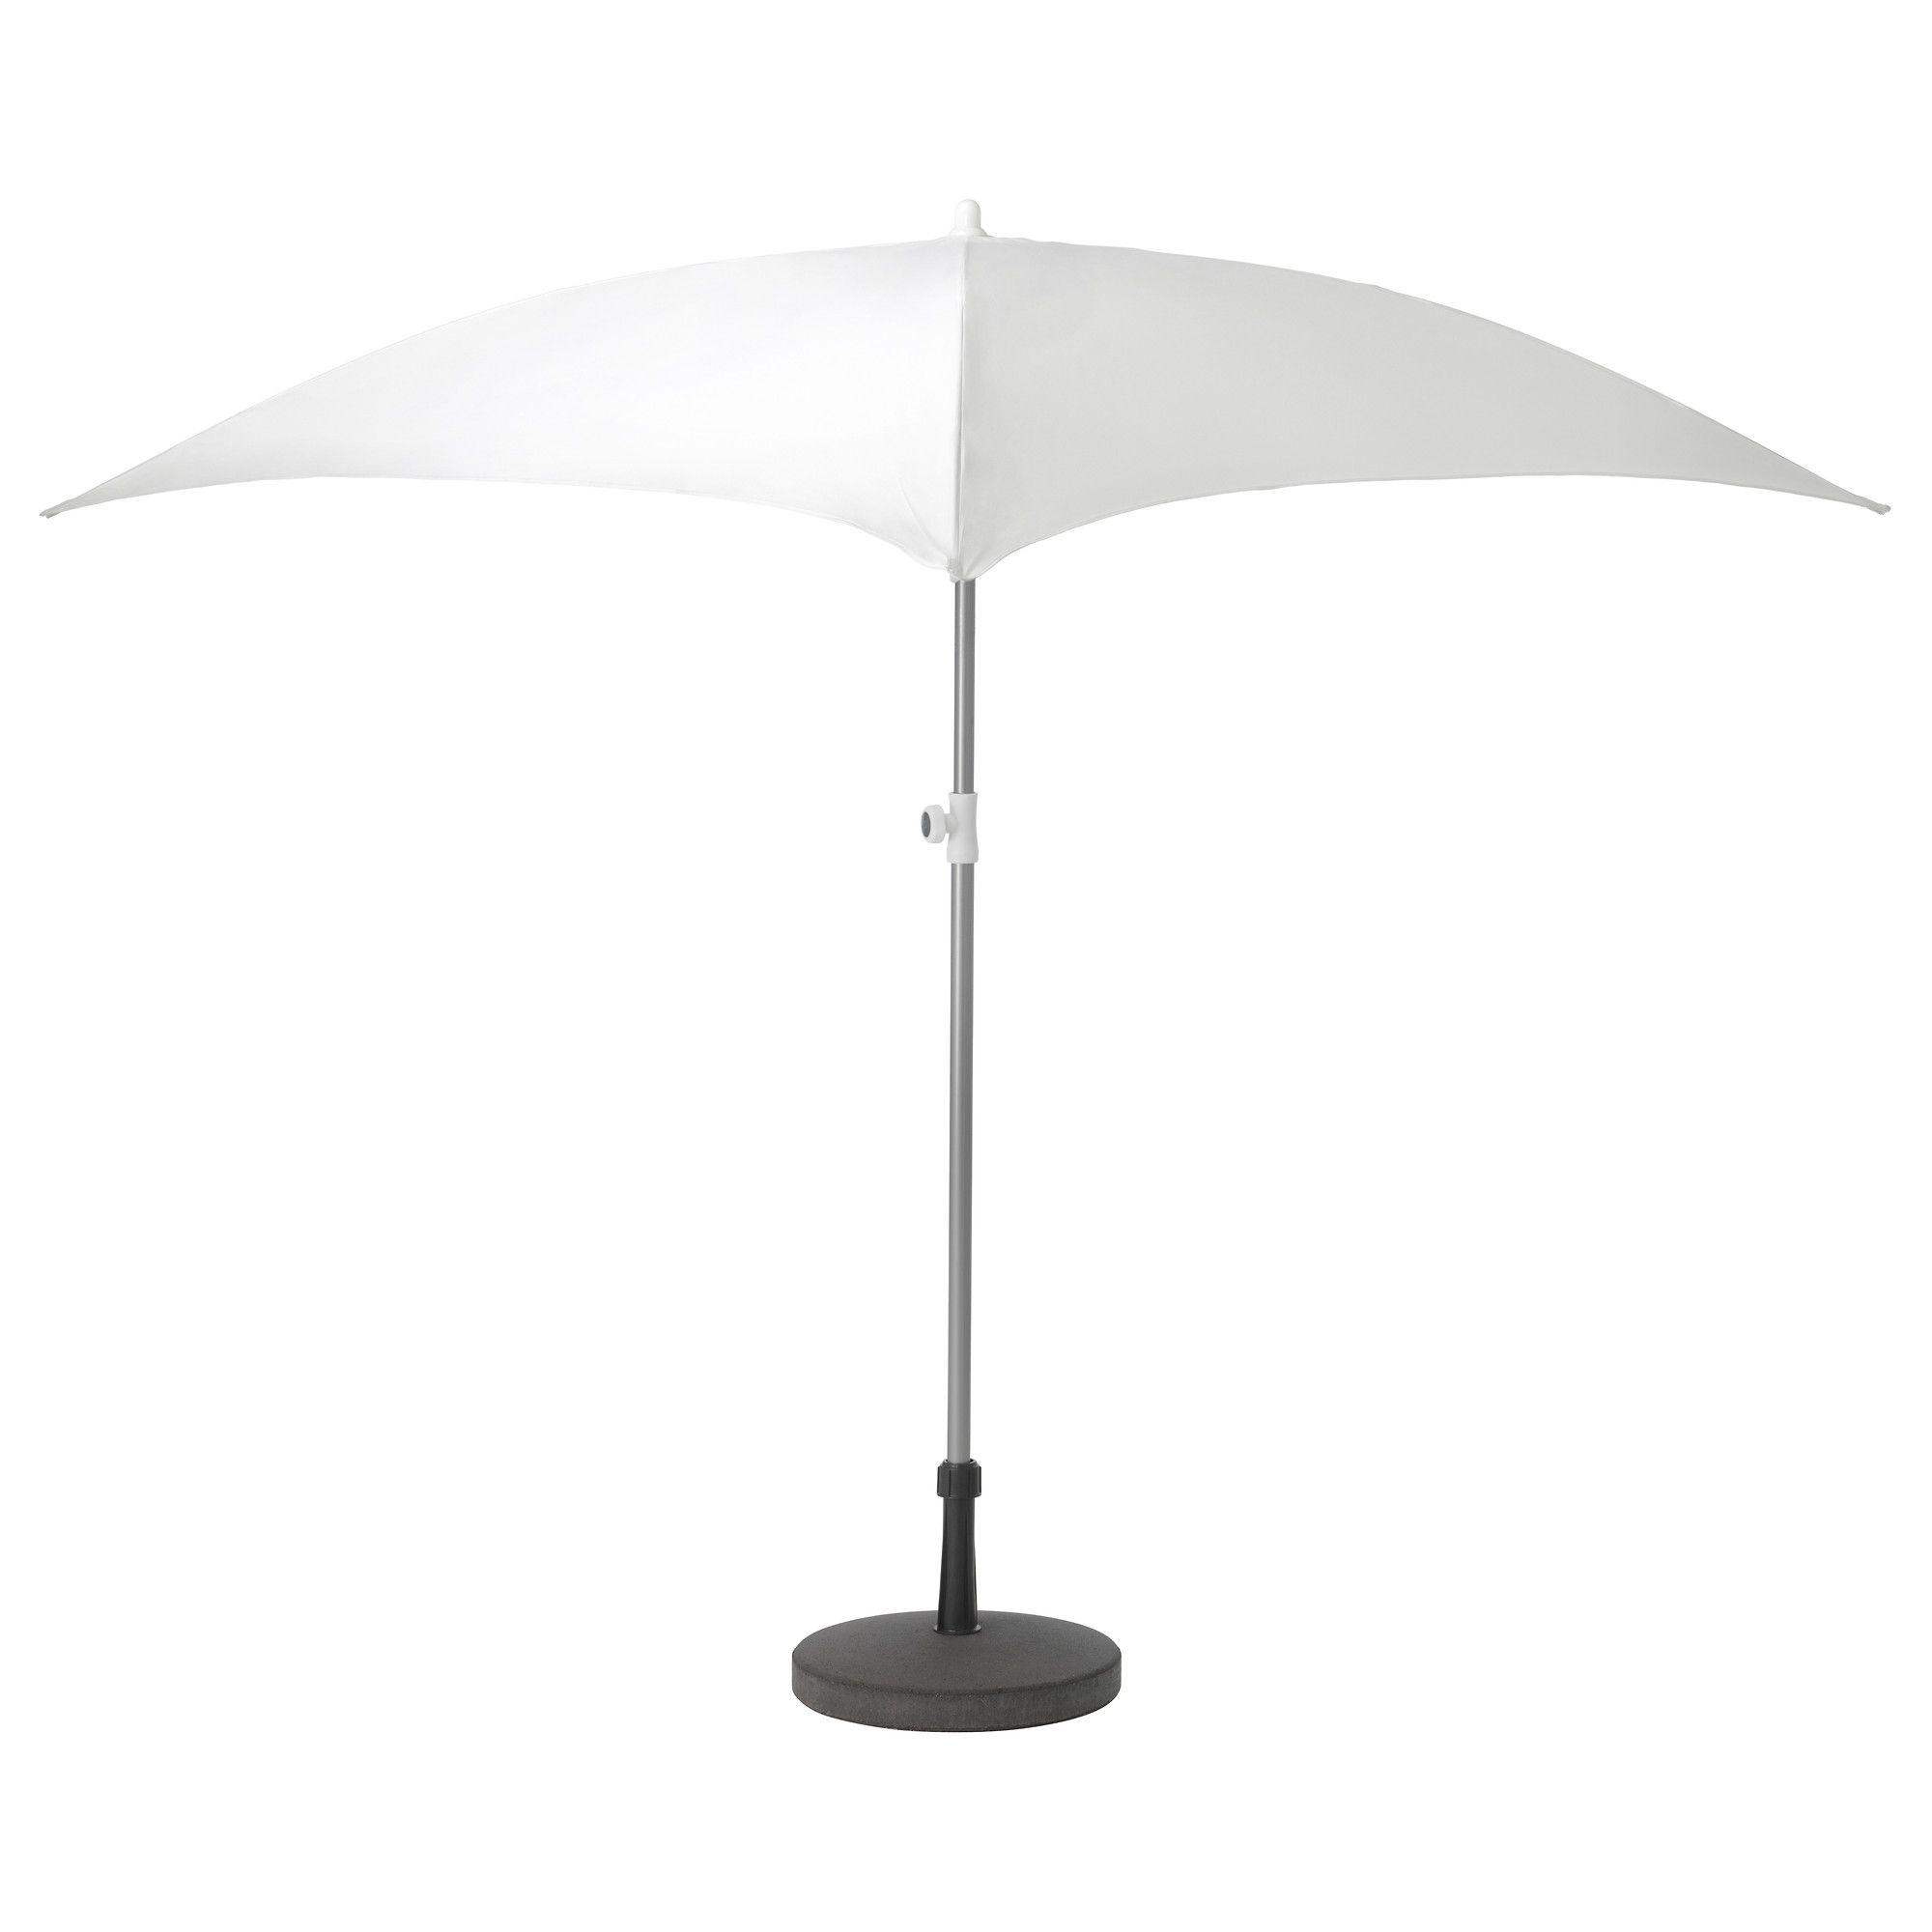 FLIS– L–K– Parasoll med fot IKEA Home